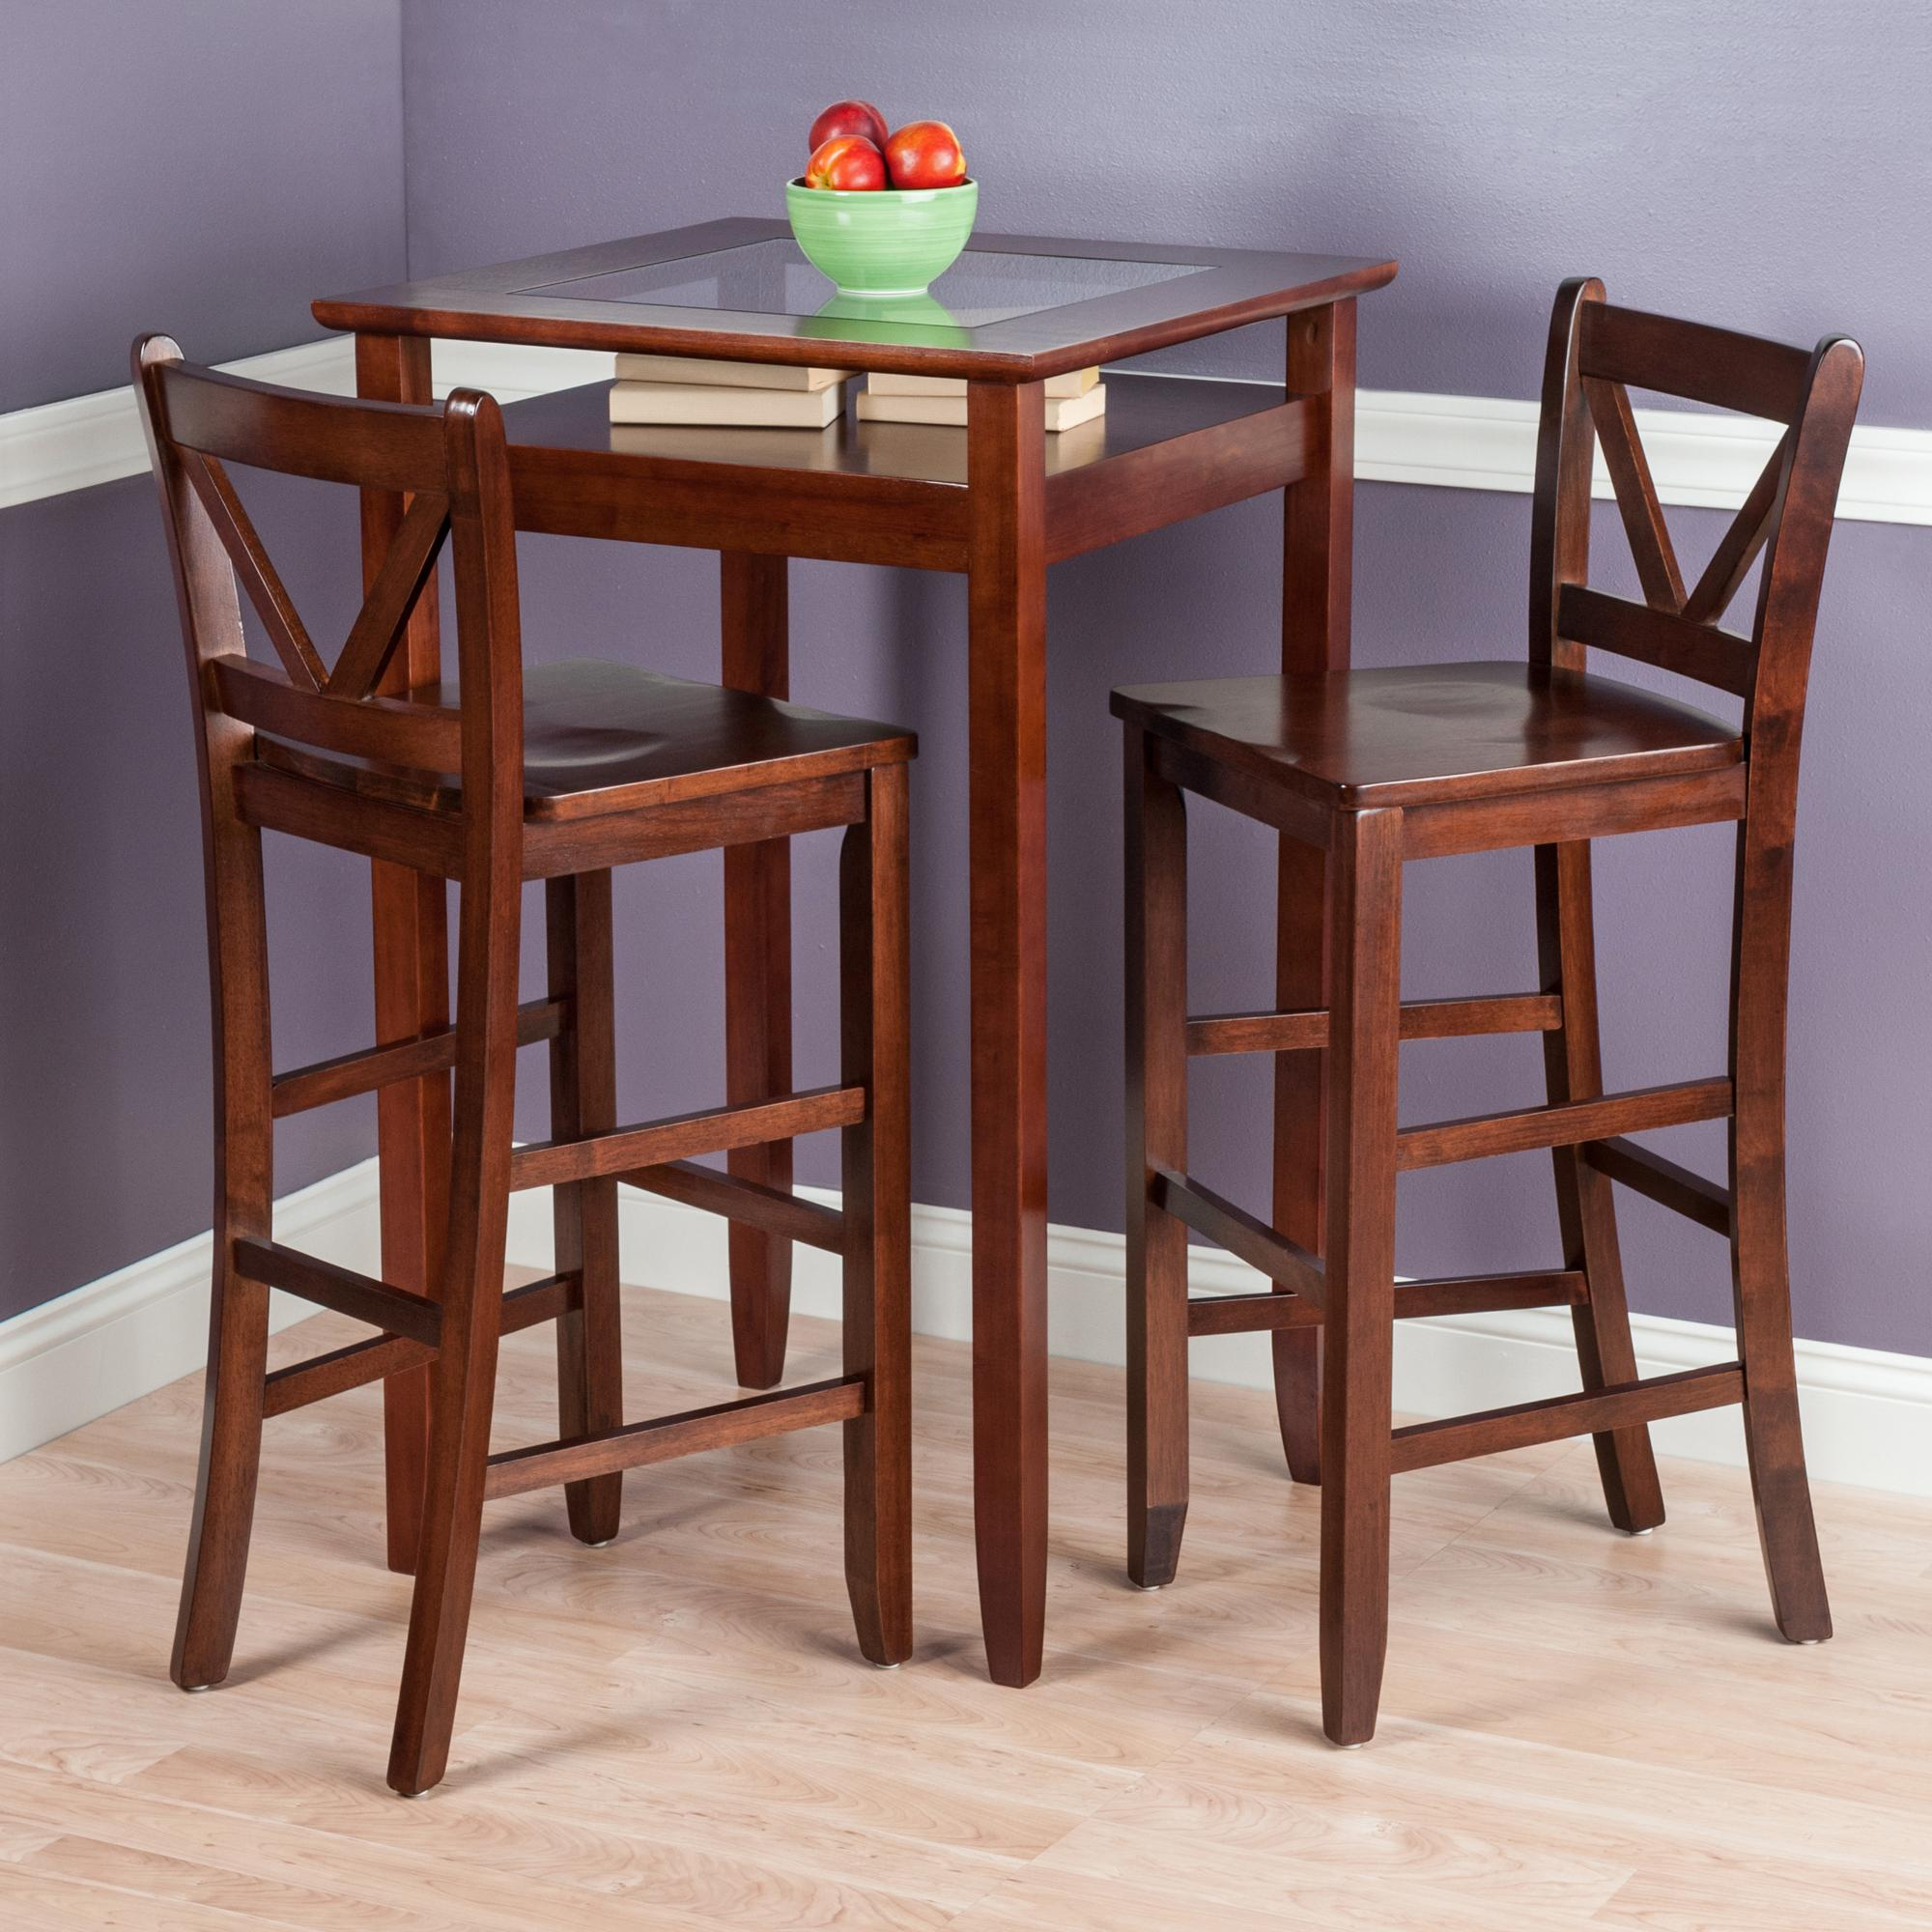 winsome wood halo 3 piece pub table set with 2 v back stools - 3 Piece Pub Table Set